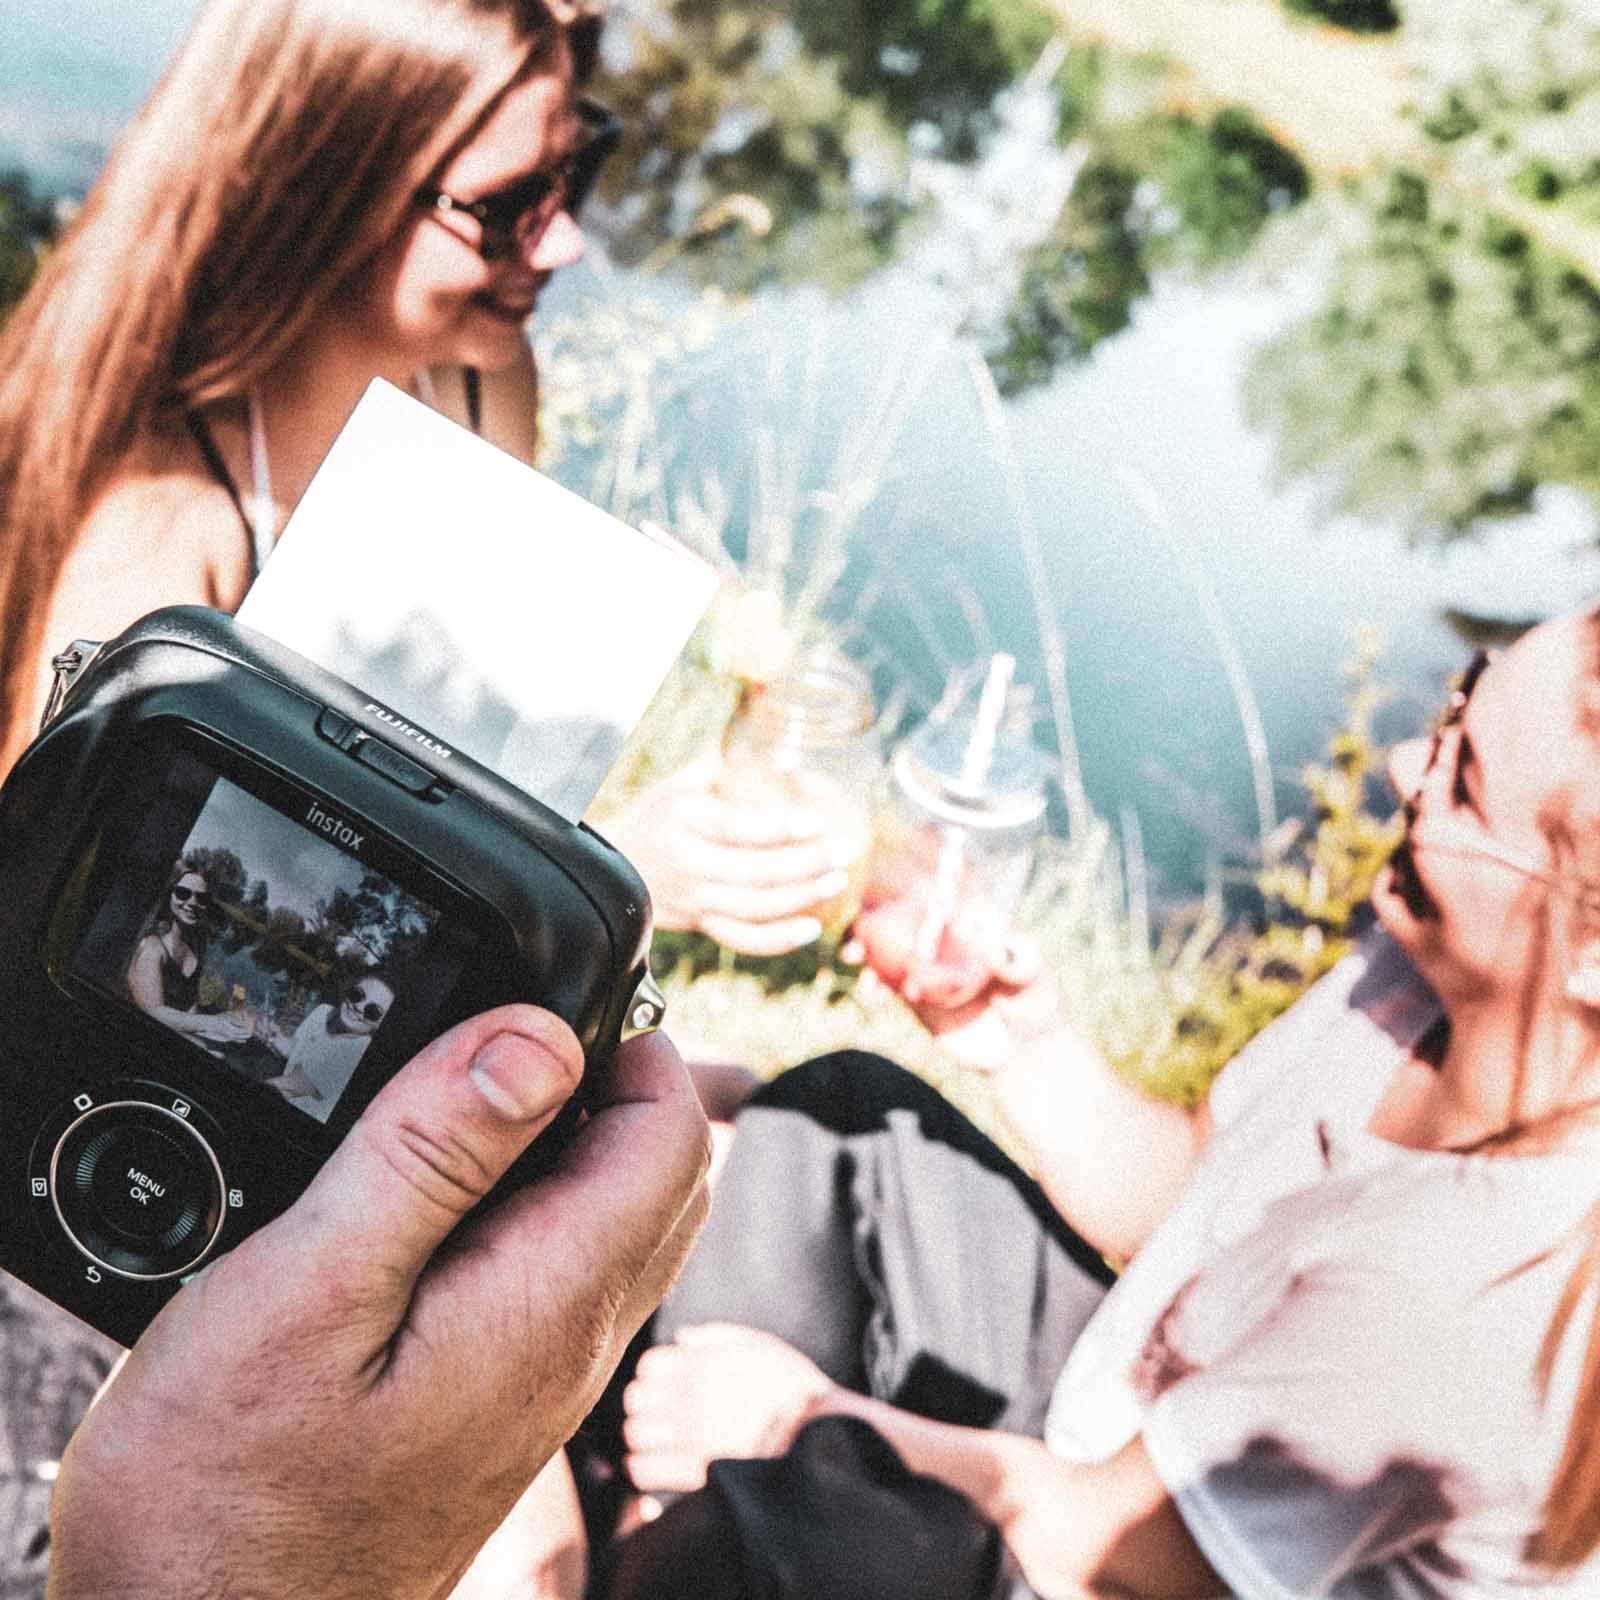 Kamera | Mieten | Polaroid | Sofortbildkamera | Hochzeit | Firmenfeier | Event | Kamera | Set | Kamera | Bundle | Buchen | Mieten | Anfragen | Leihen